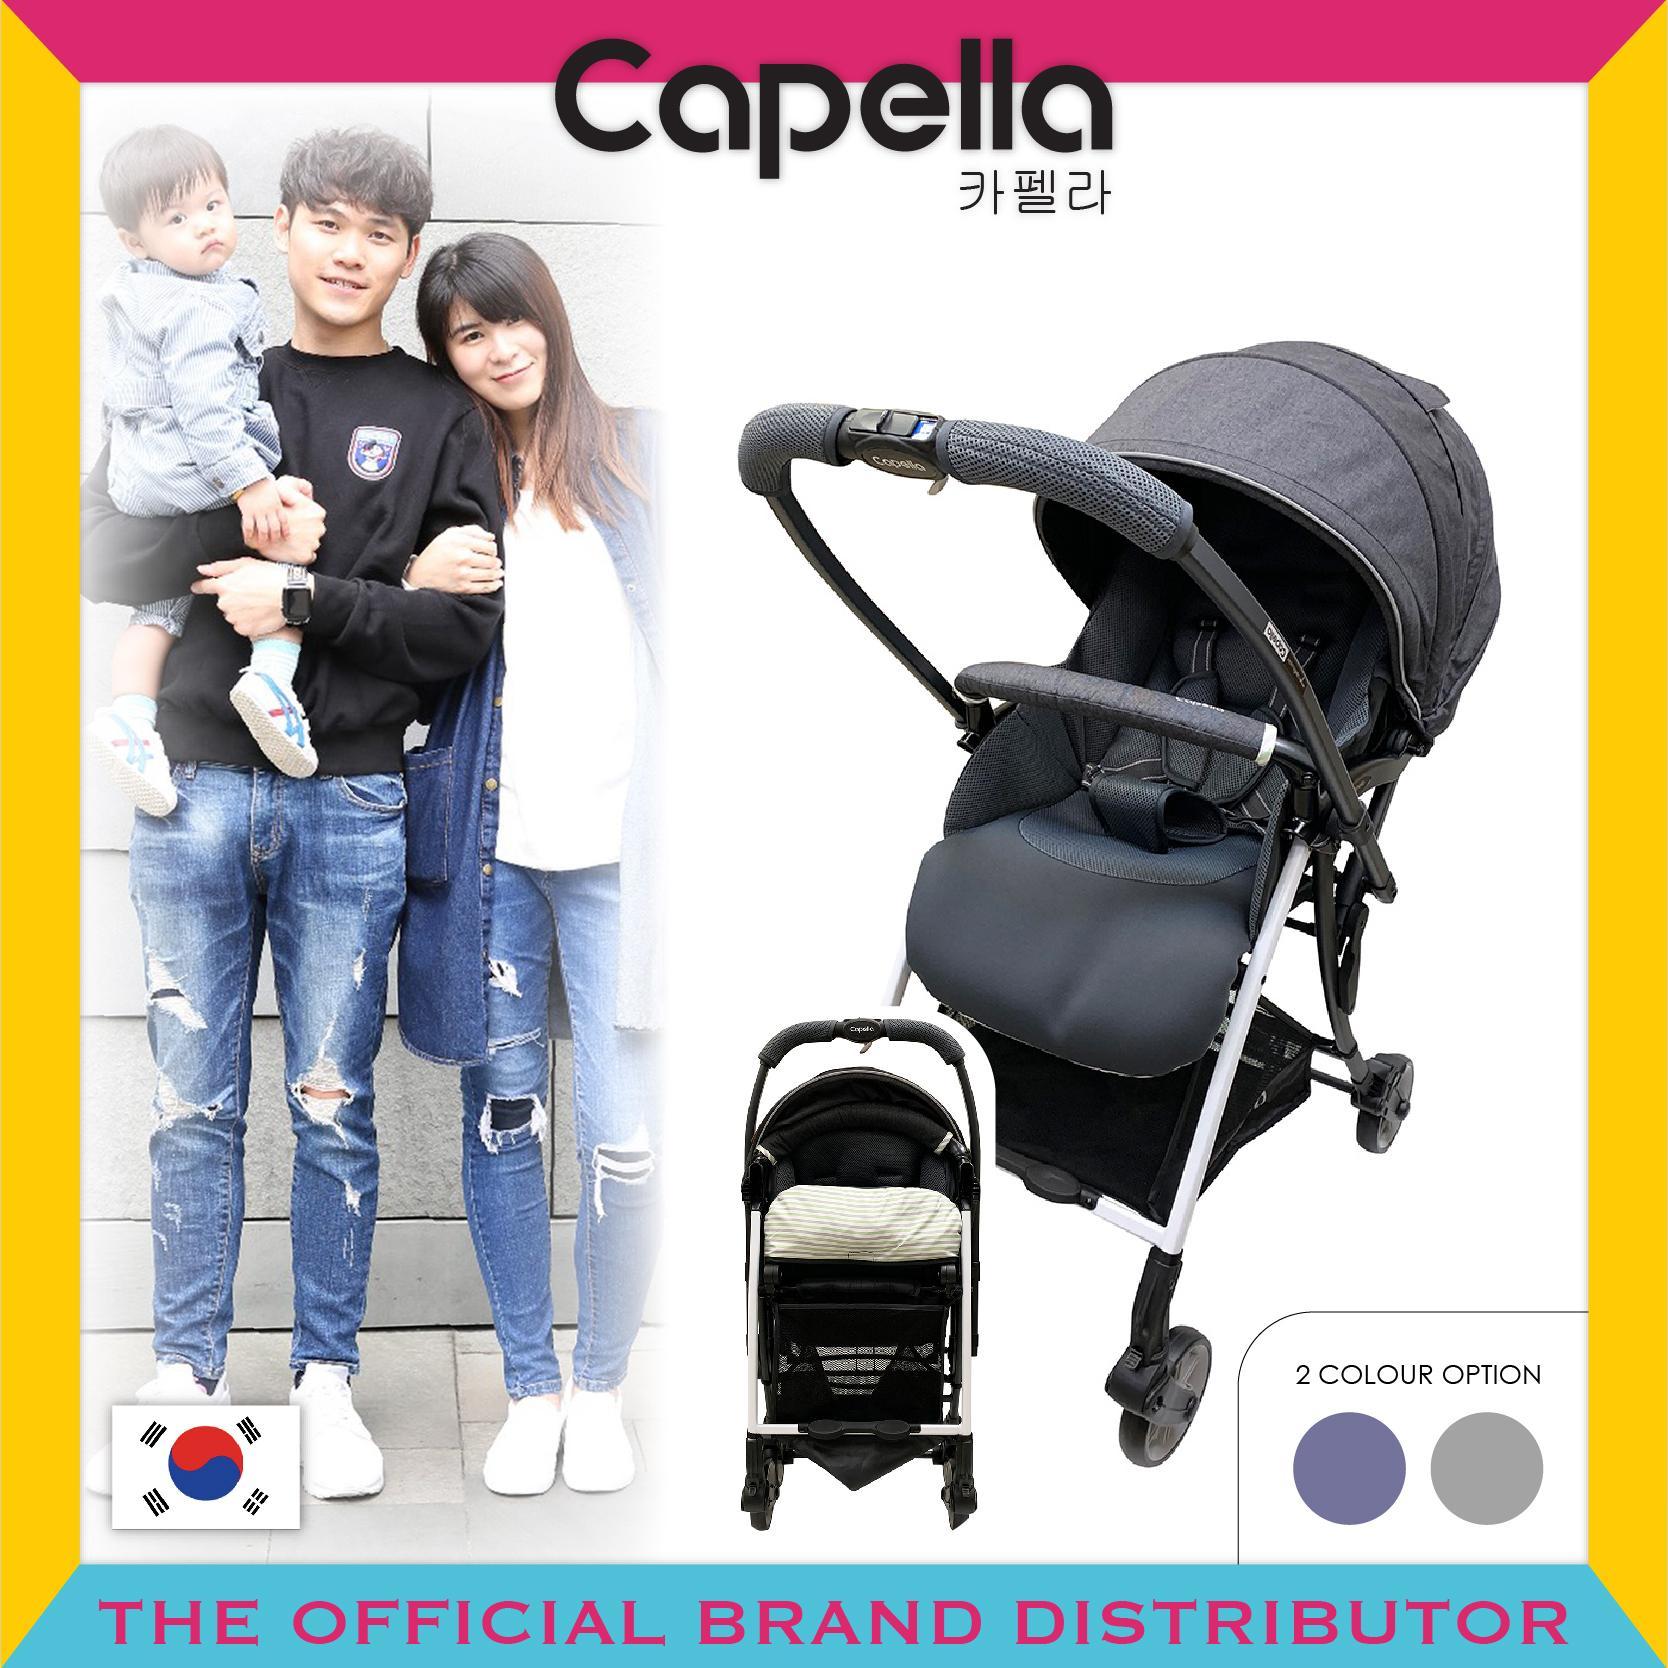 Capella® S206-19-DG / S206-19-NV Wi-Lite Plus Stroller Dark Grey / Navy(Black)